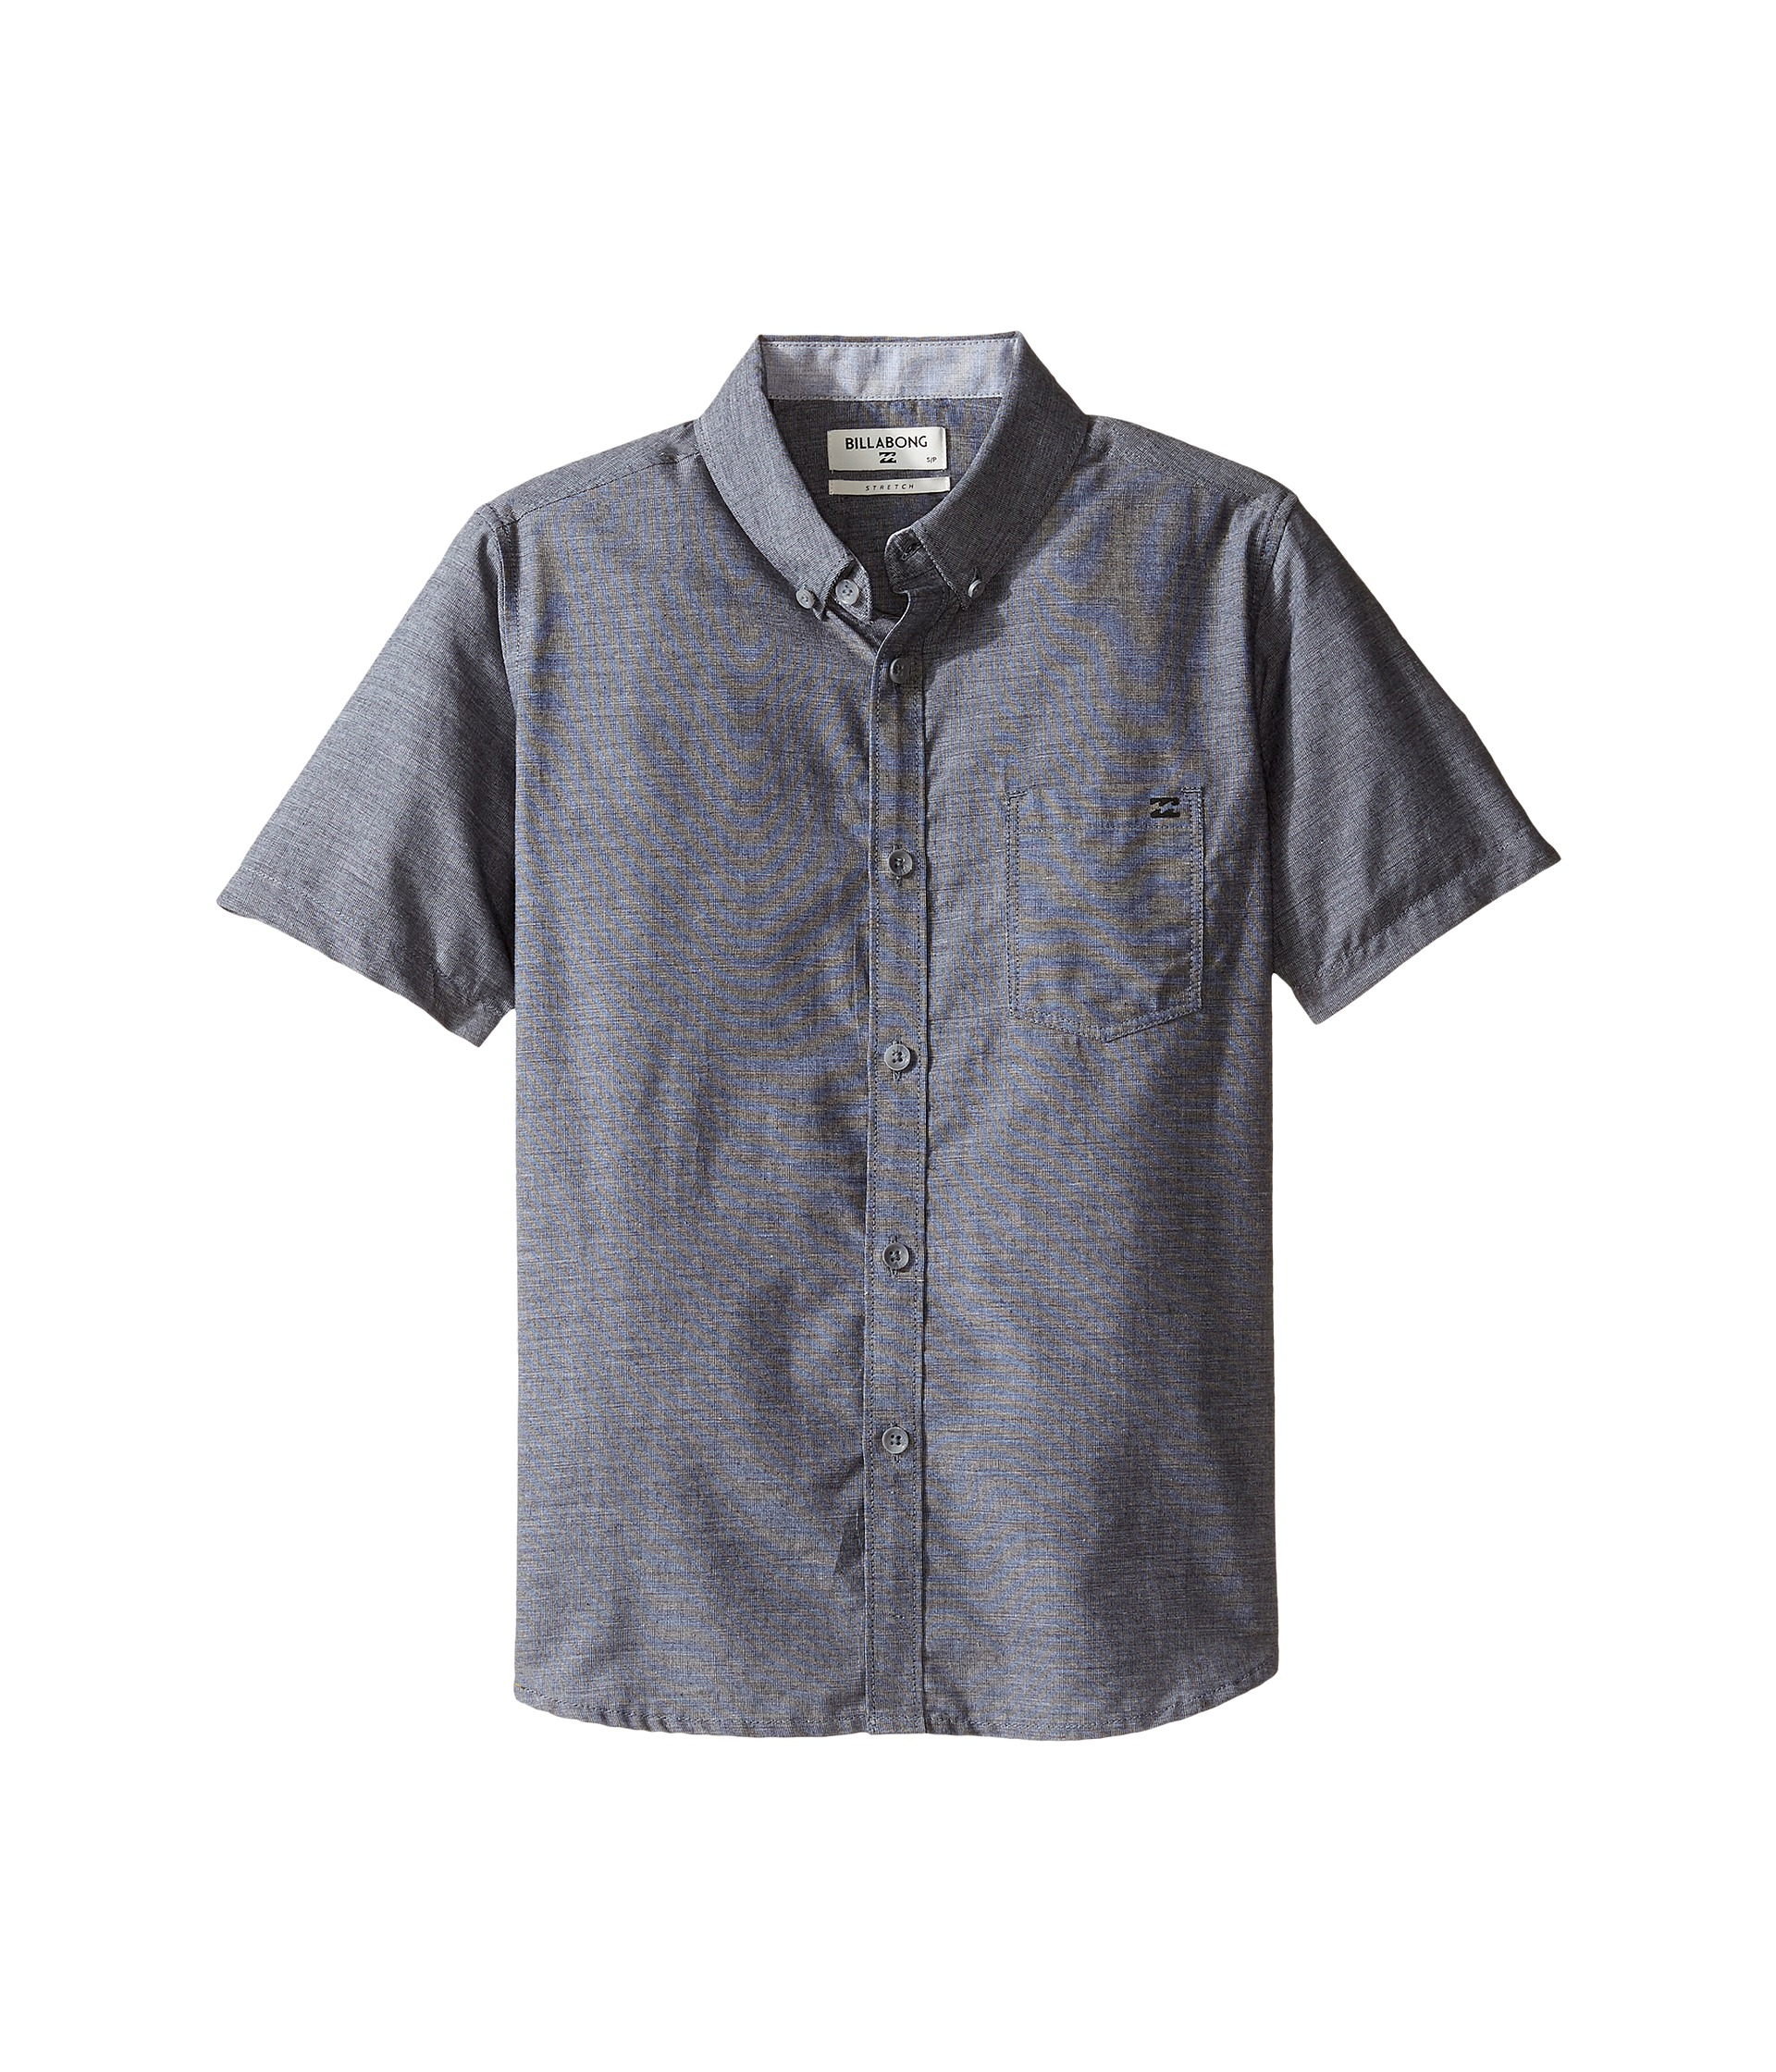 Billabong kids all day chambray short sleeve shirt big for Chambray shirt for kids